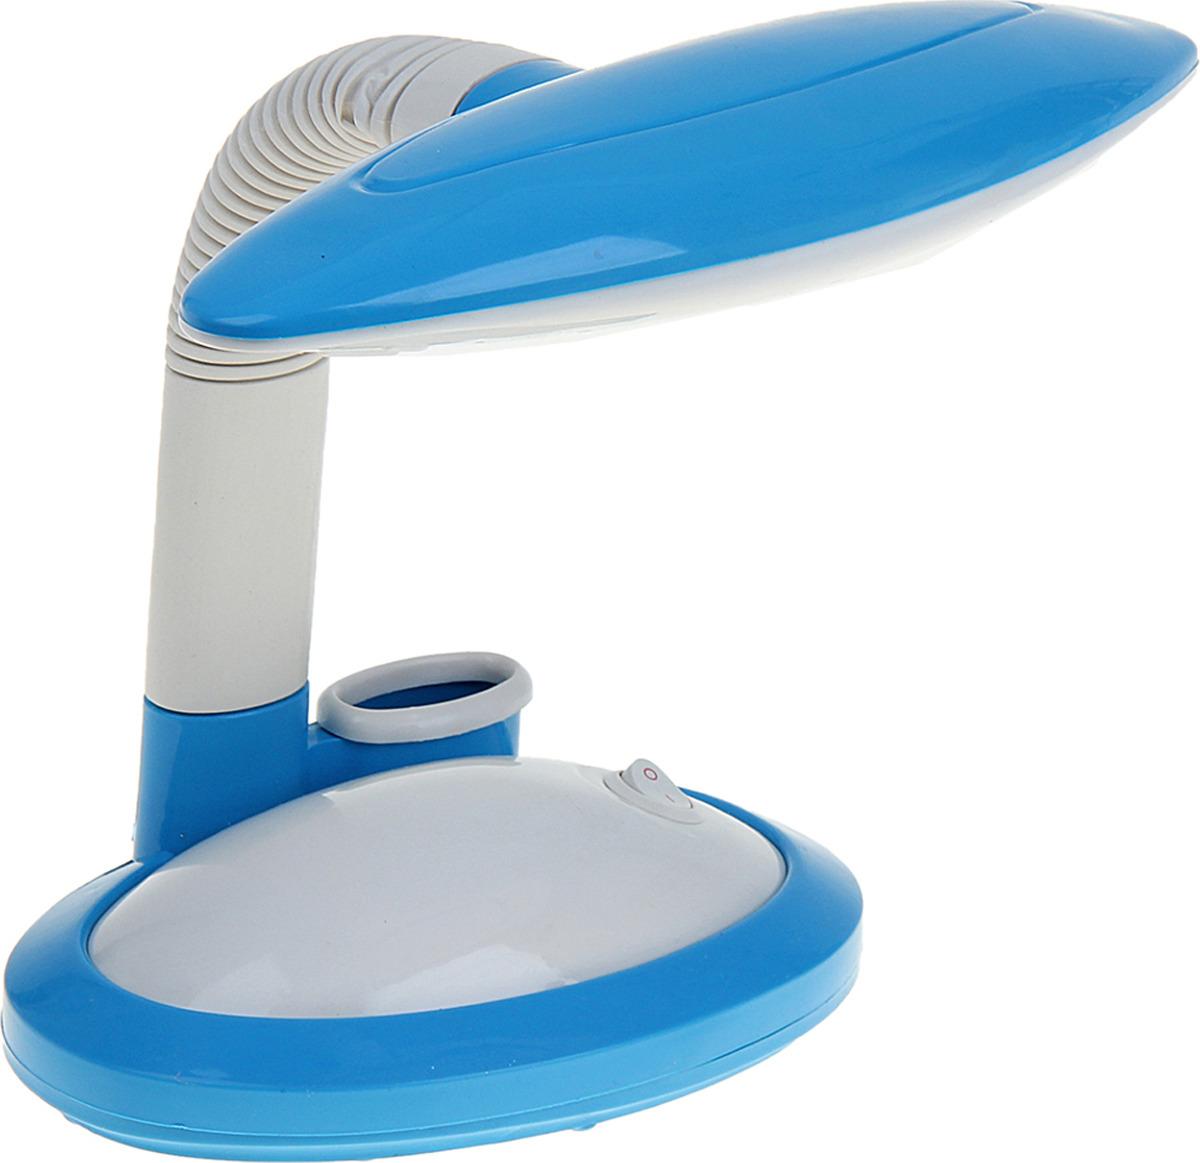 Настольный светильник Risalux, LED, 1050324, голубой, 16 х 16 х 25 см